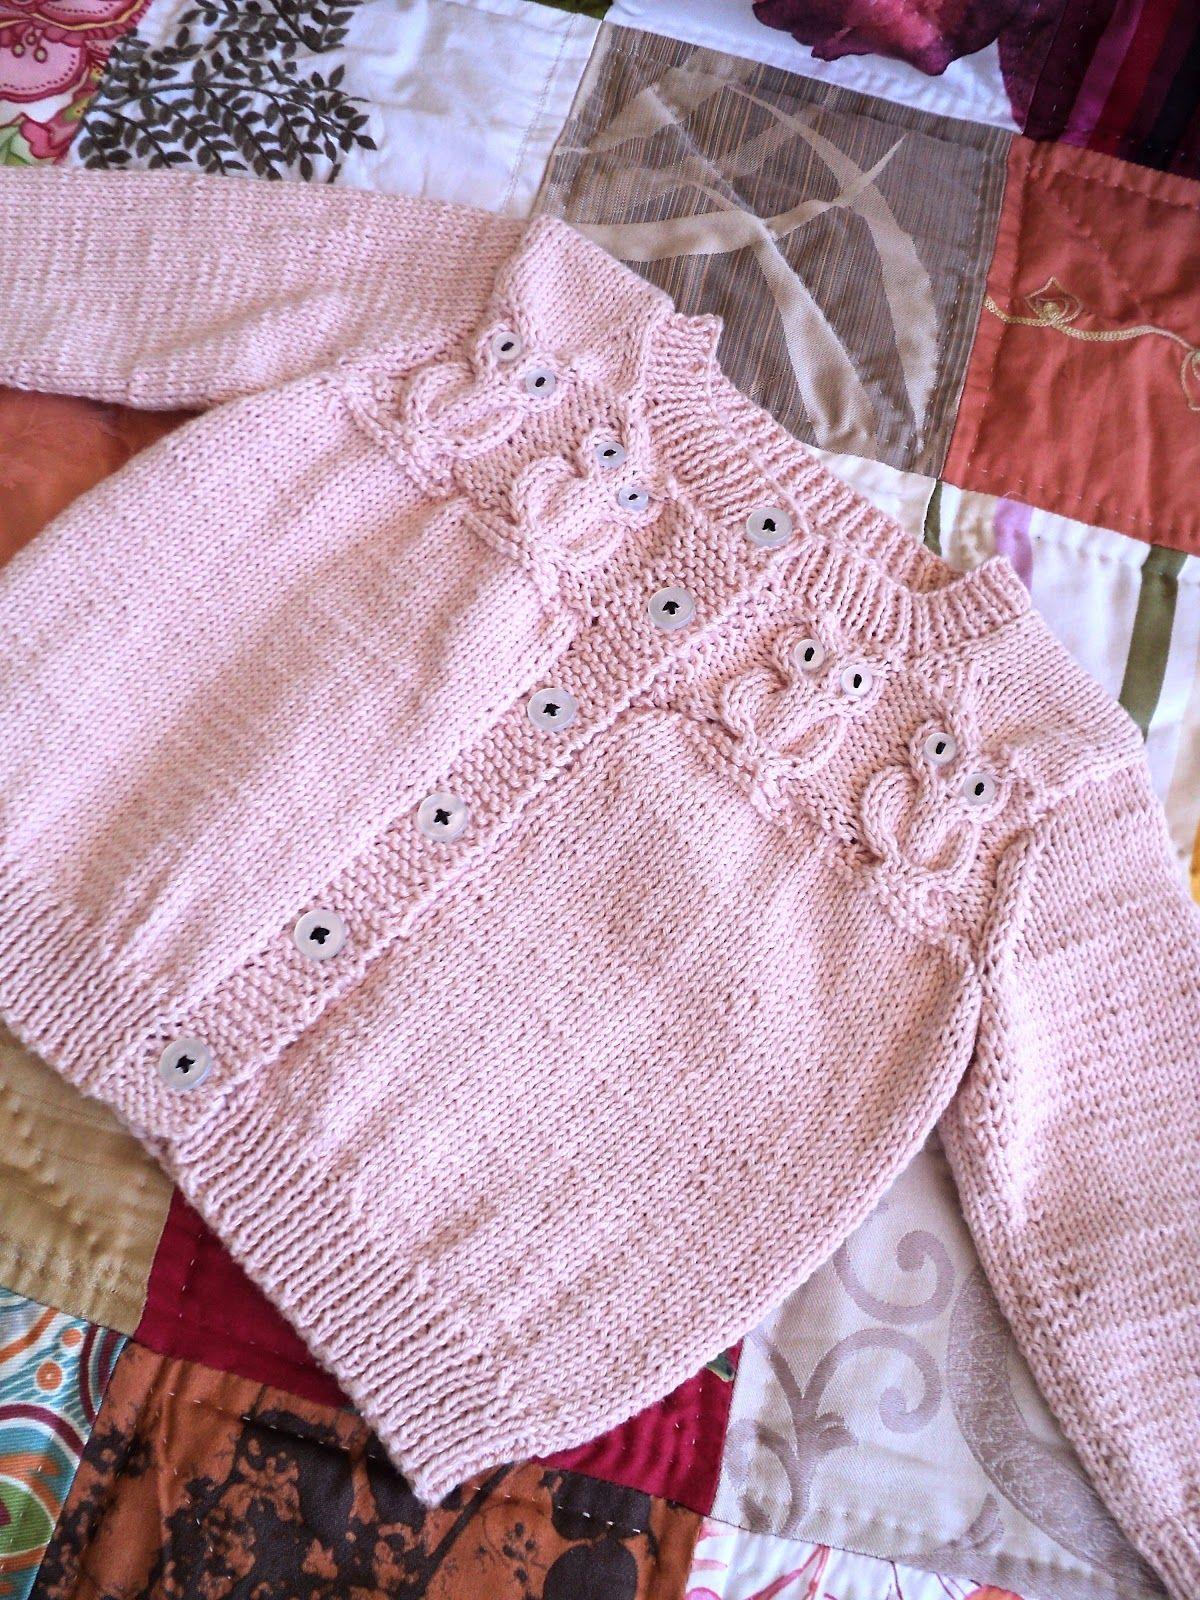 DSC02069.JPG 1,200×1,600 pixeles | Mi roperito | Pinterest | Crochet ...